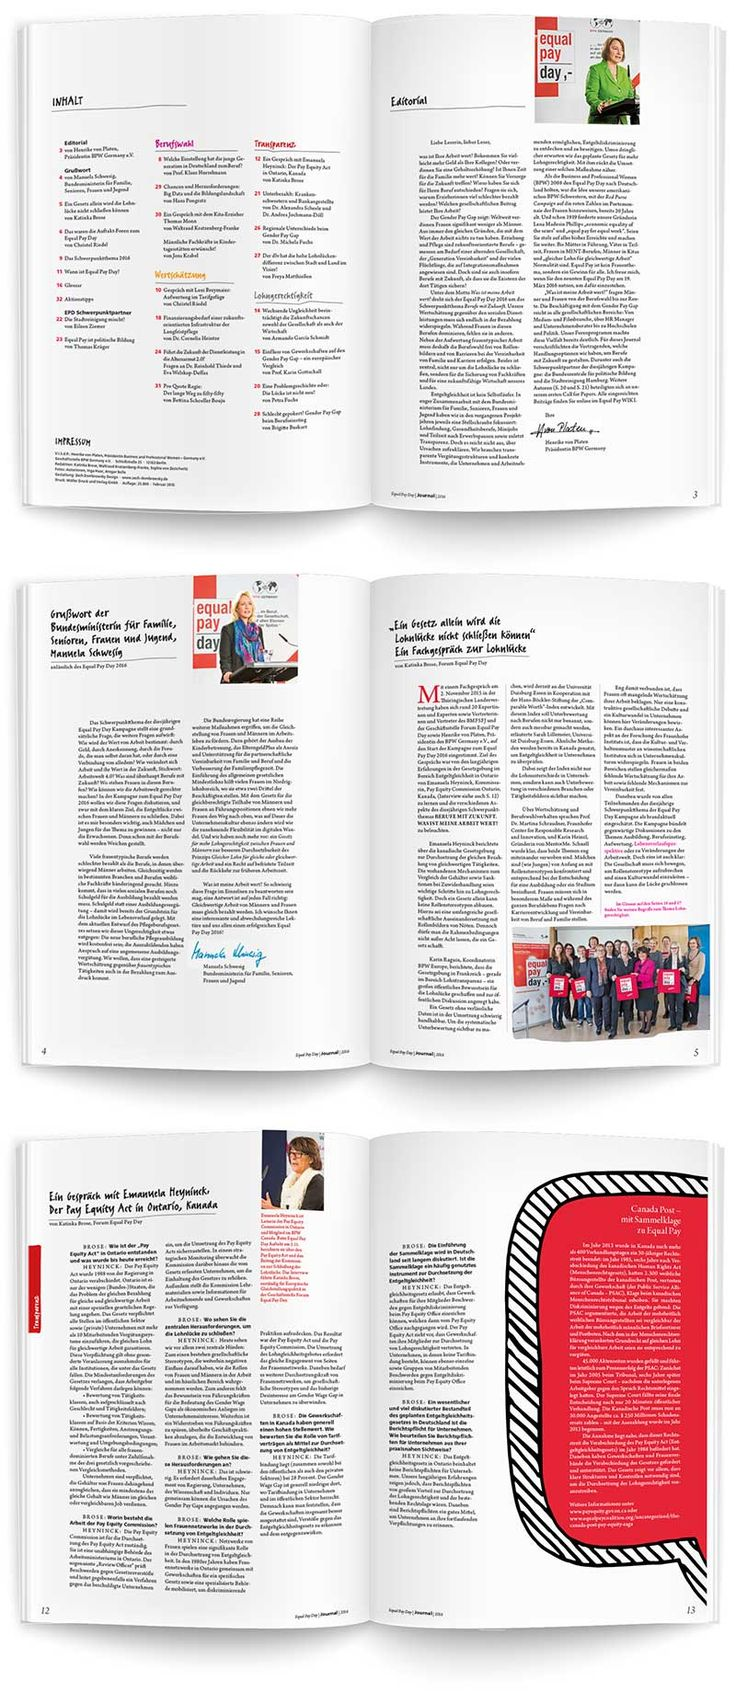 Magazin Layout Equal Pay Day 2016, Germany, A4, Zech Dombrowsky Design